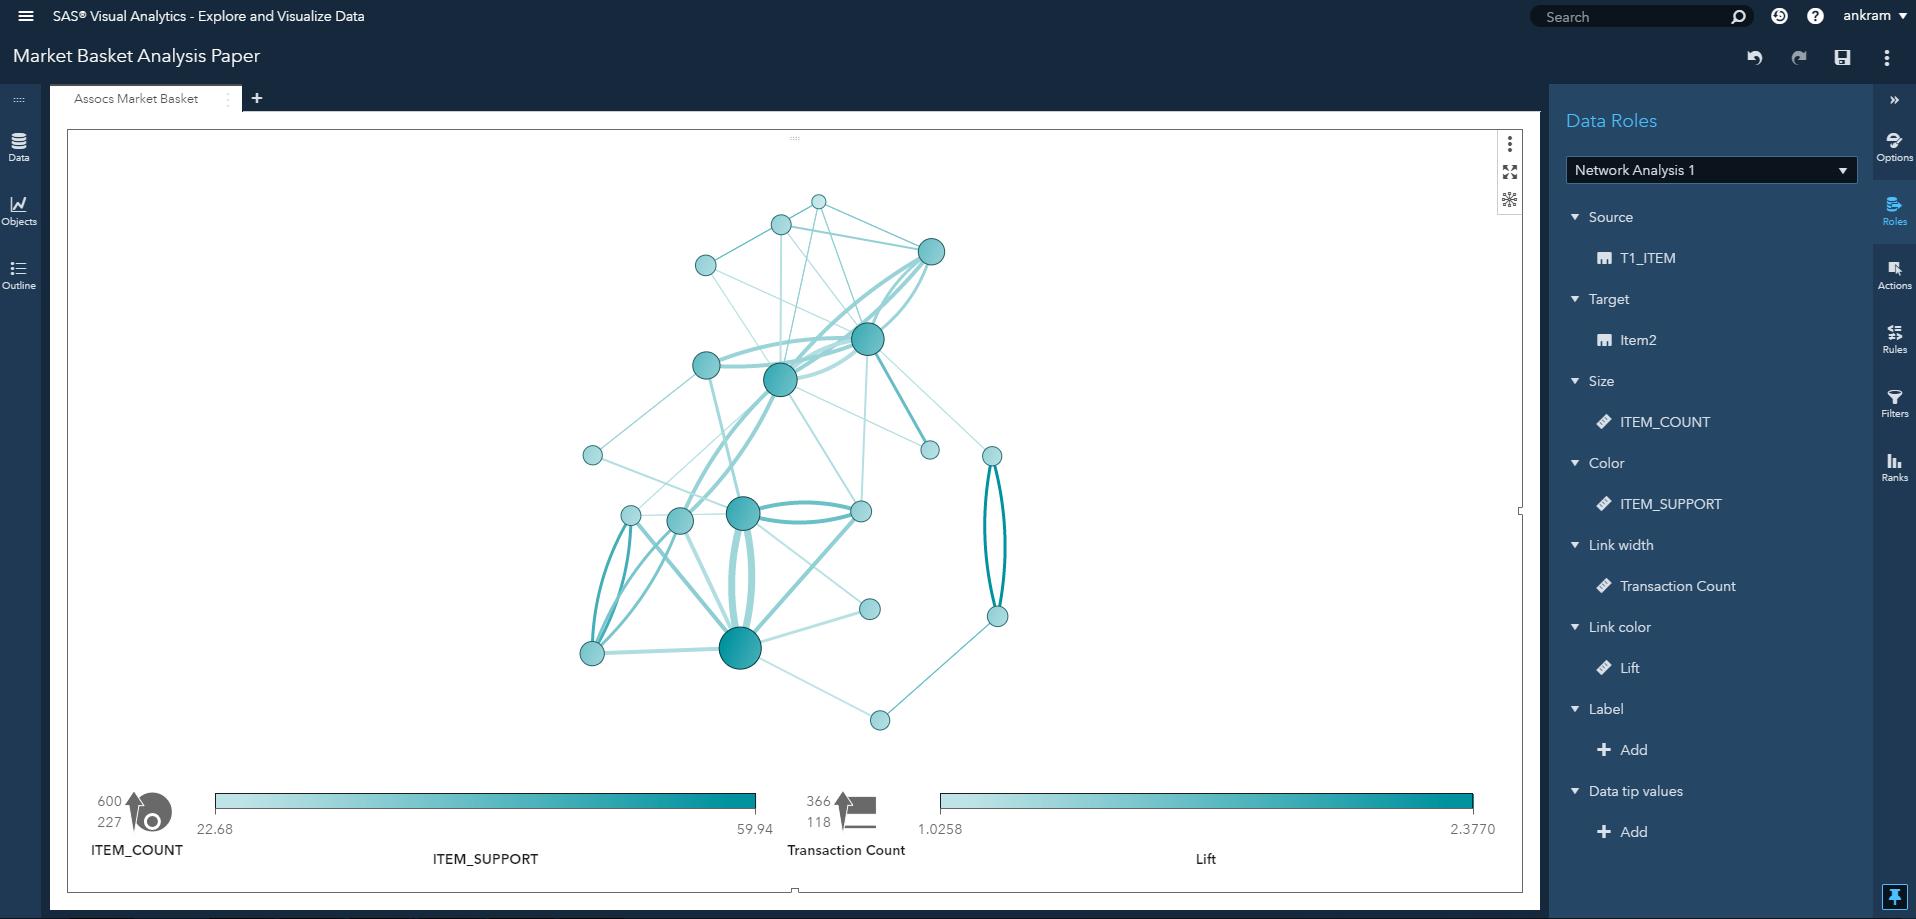 Visual Data Mining and Machine Learning